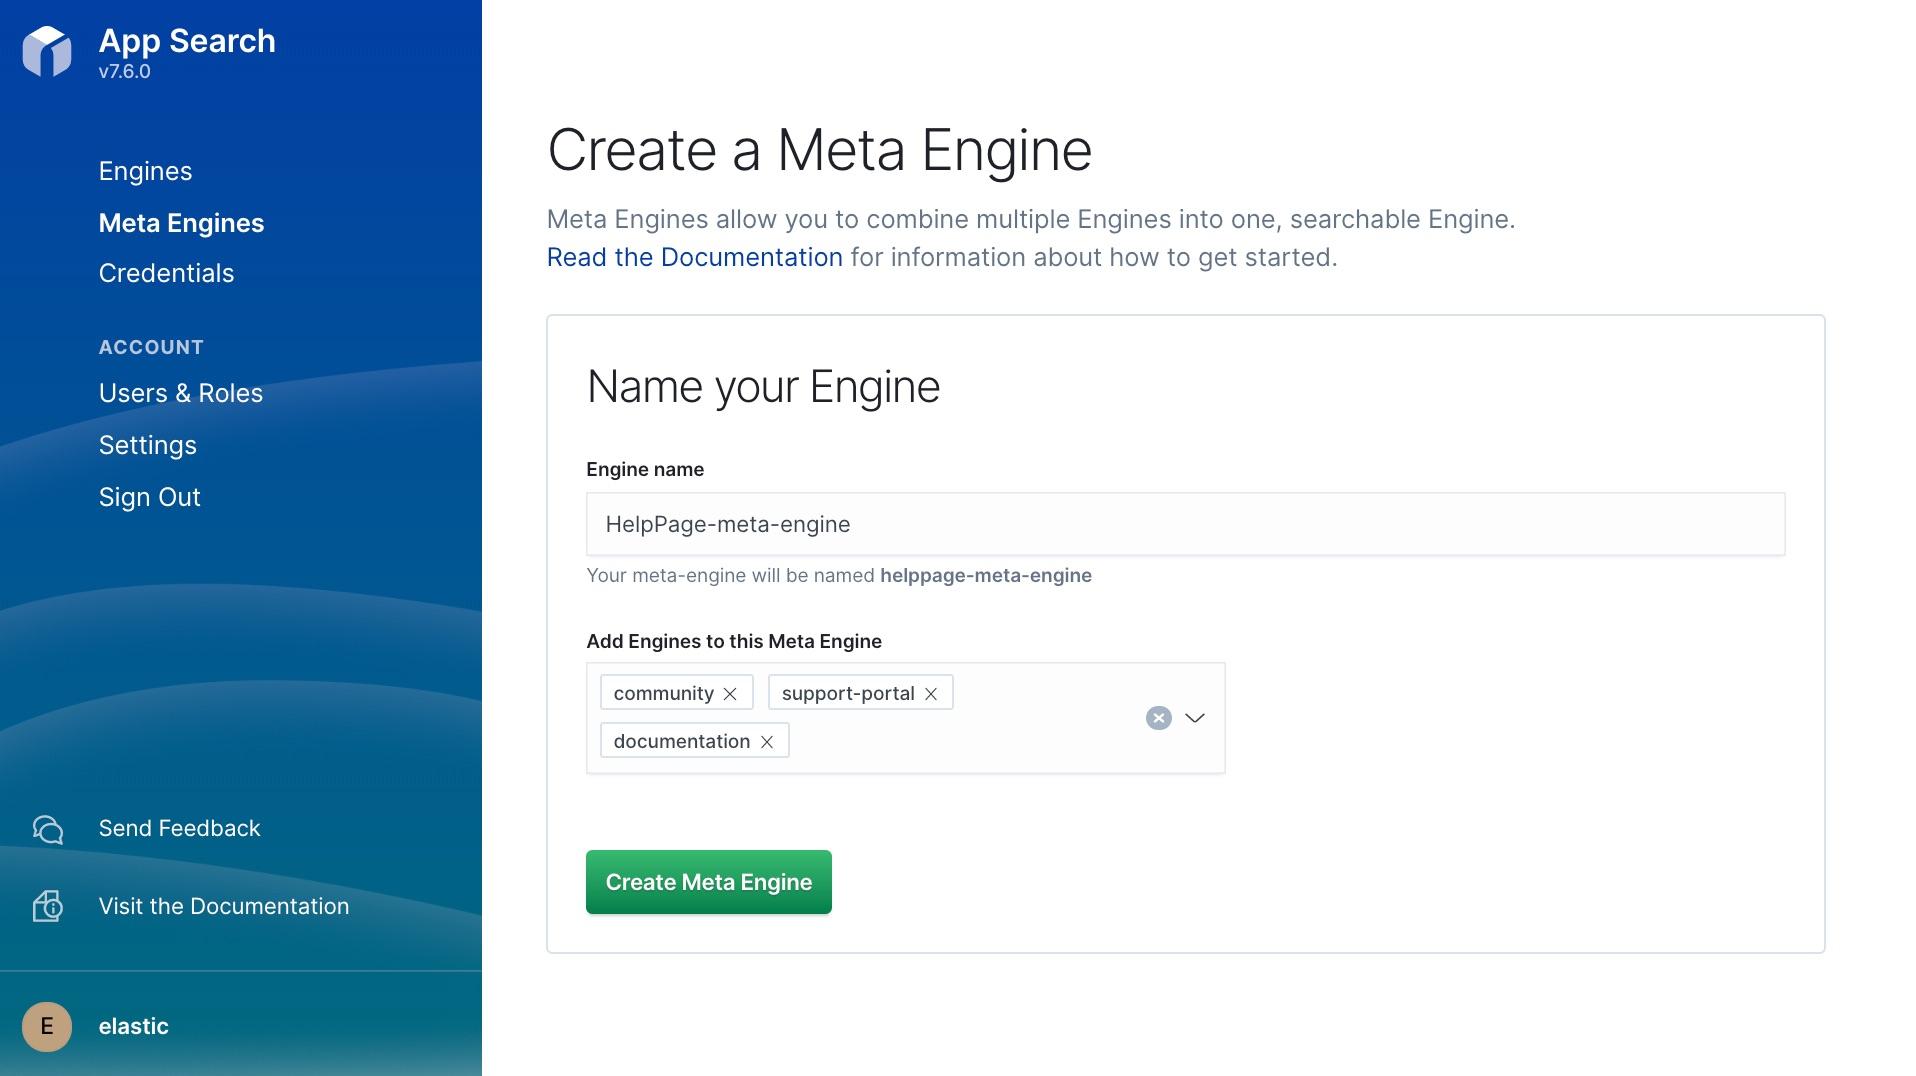 Creating a new meta engine